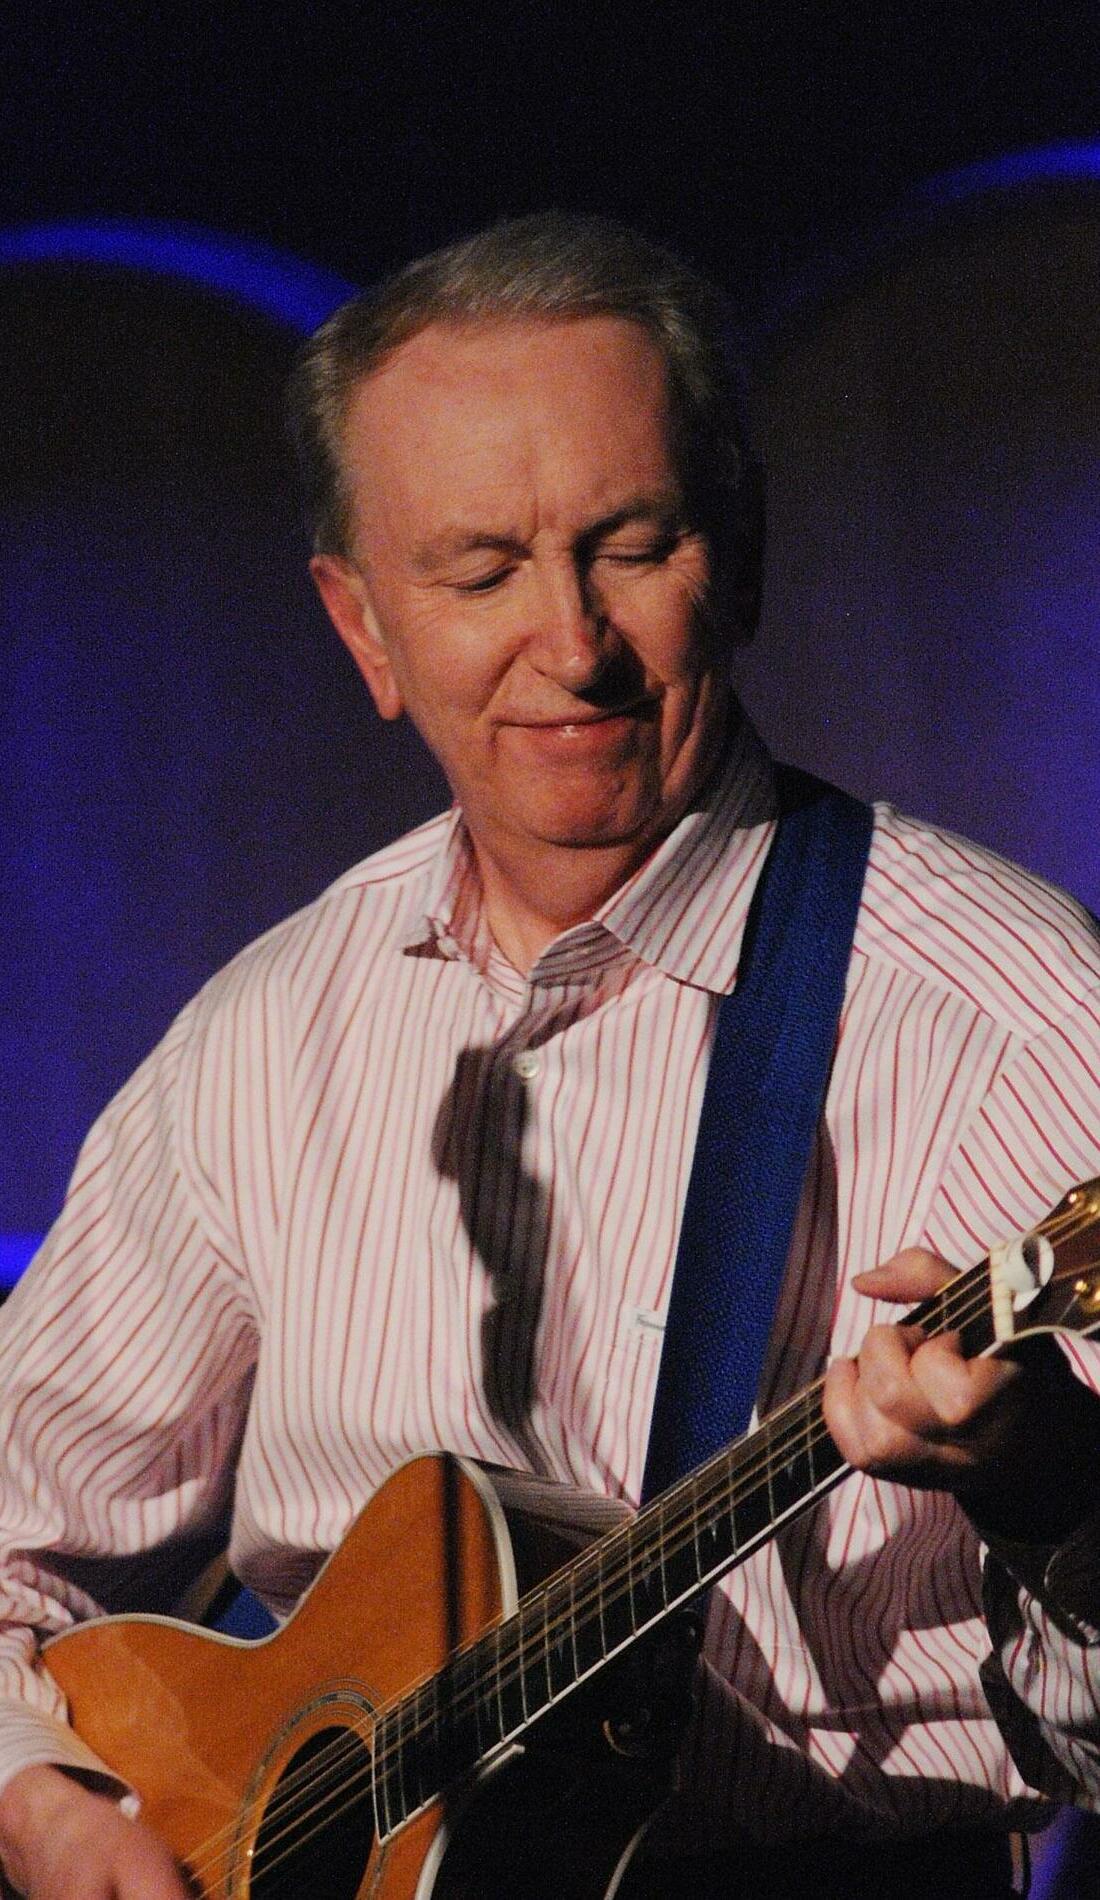 A Al Stewart live event